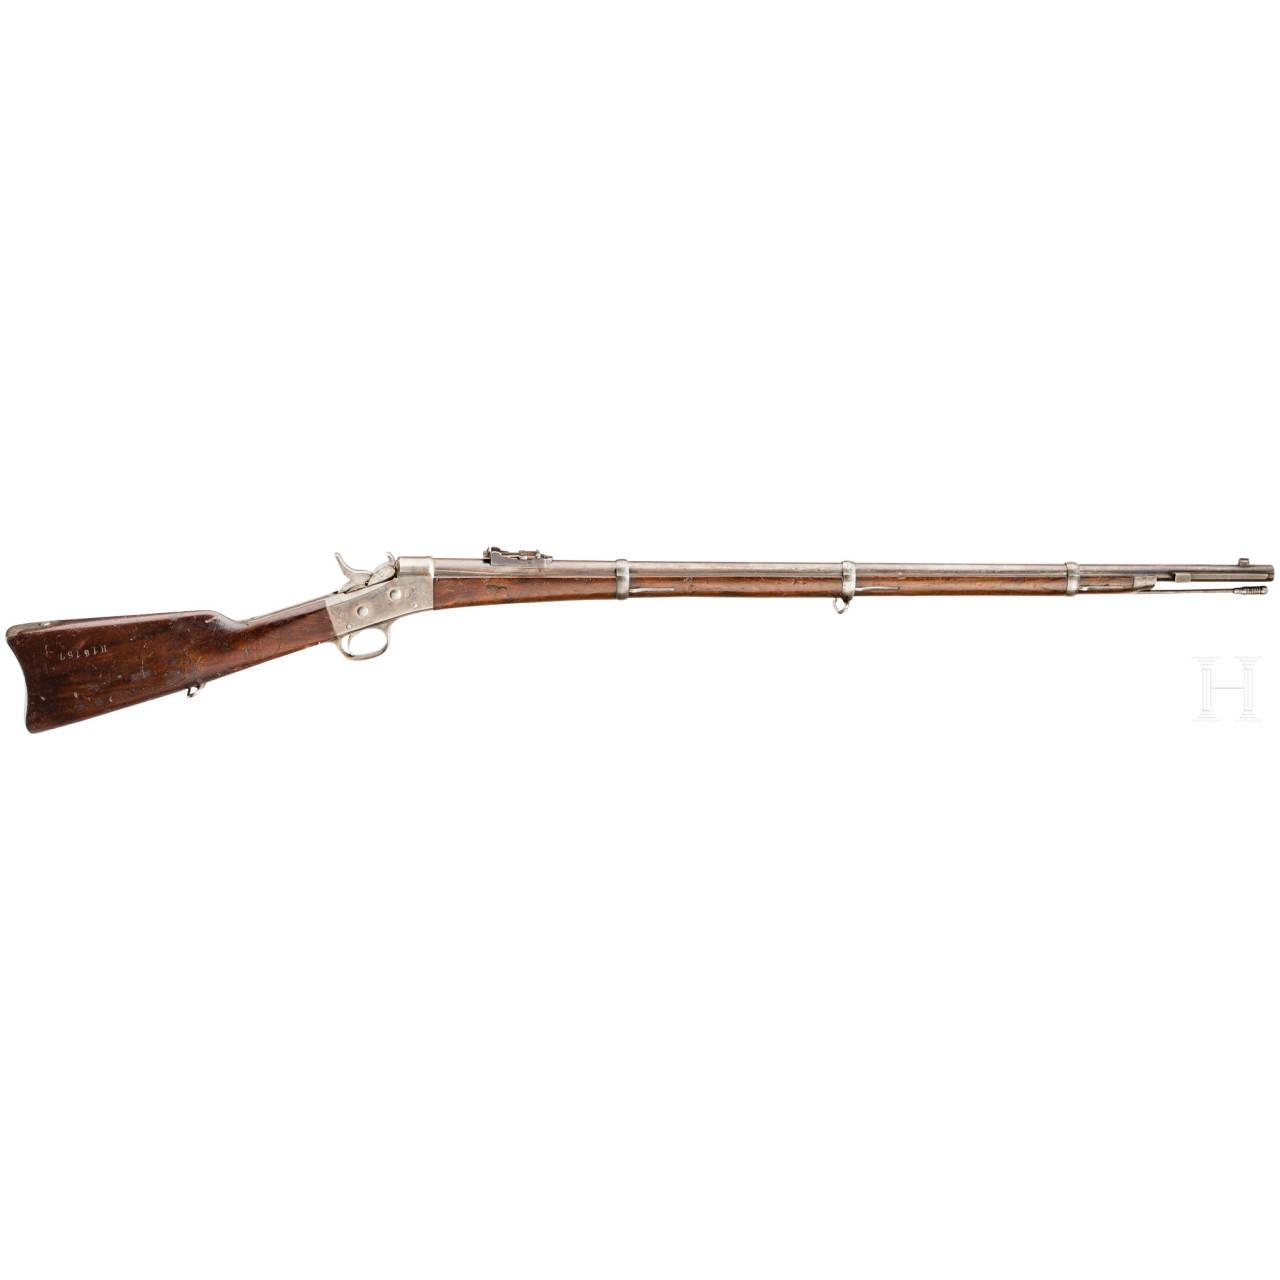 Remington Rolling Block Military Rifle